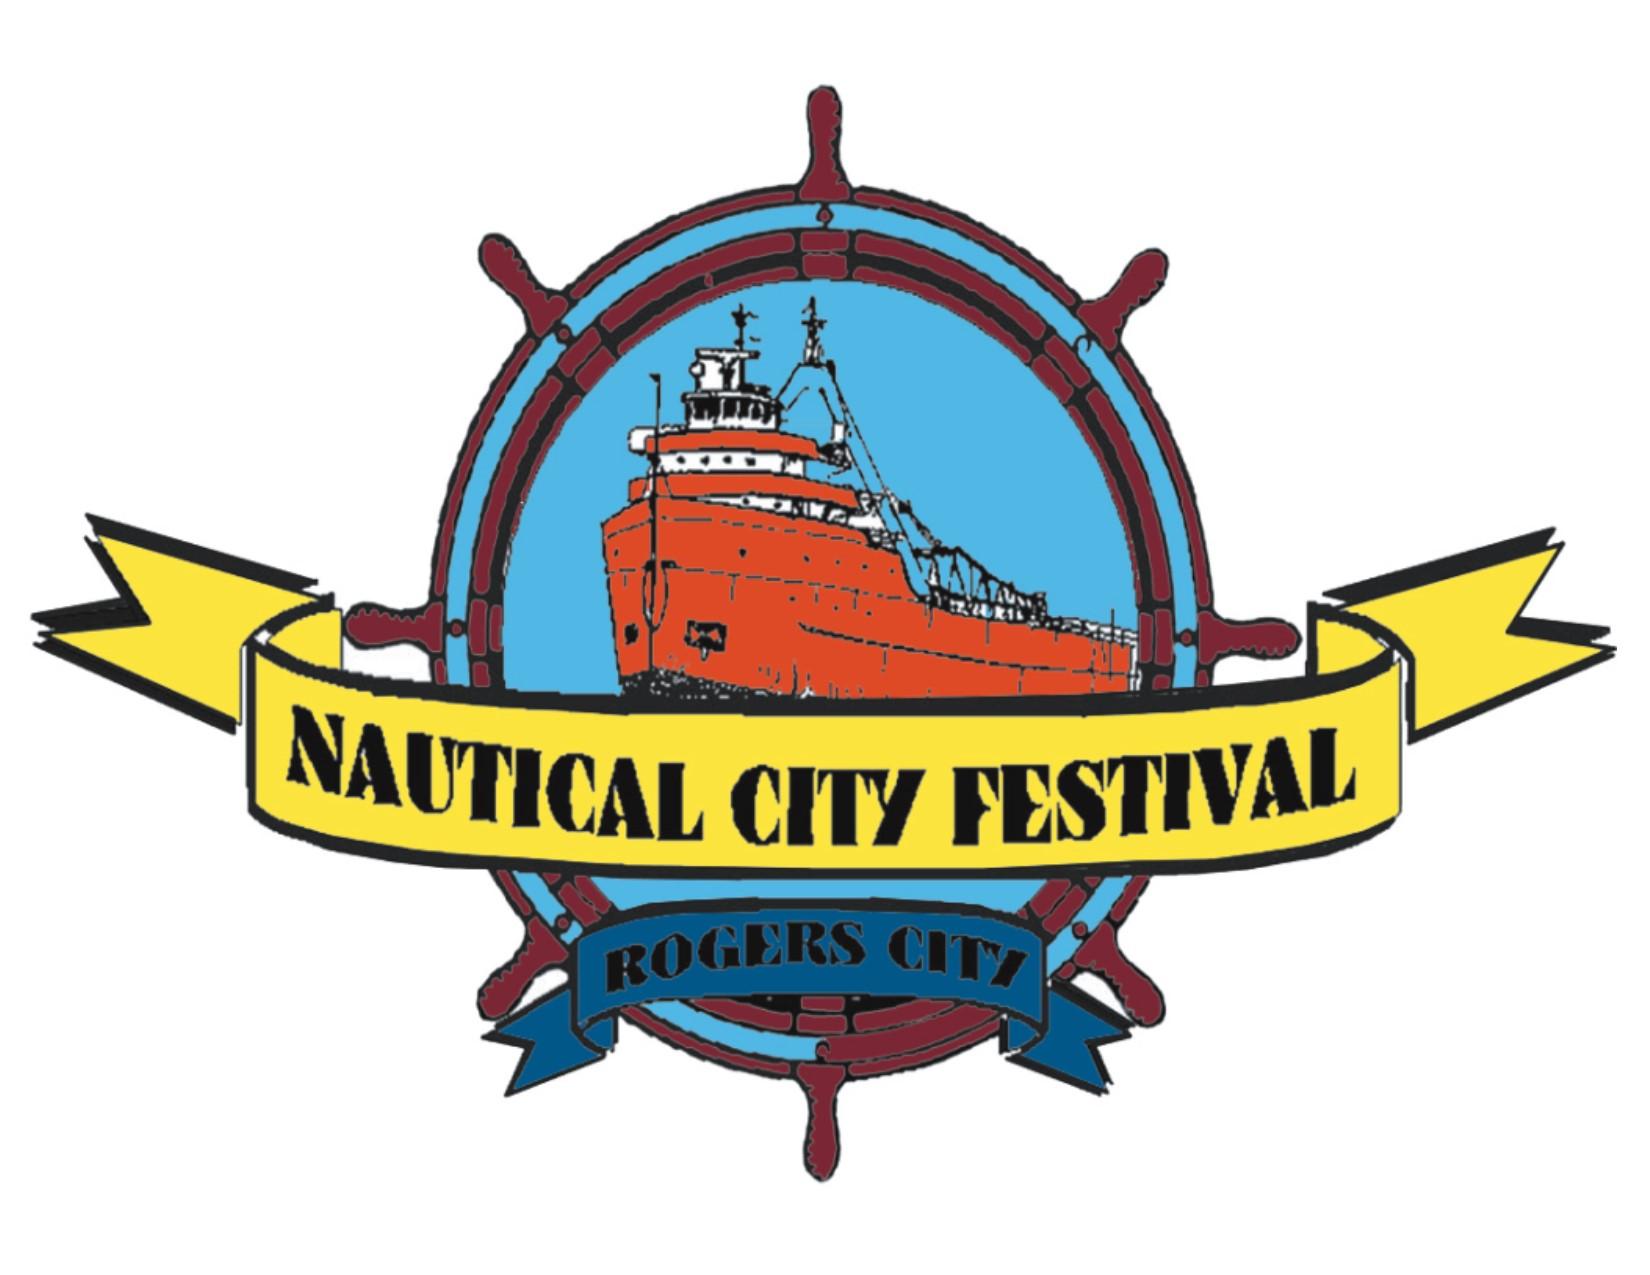 Nautical City Festival - PO Box 55Rogers City, MI 49779(989) 734-4656